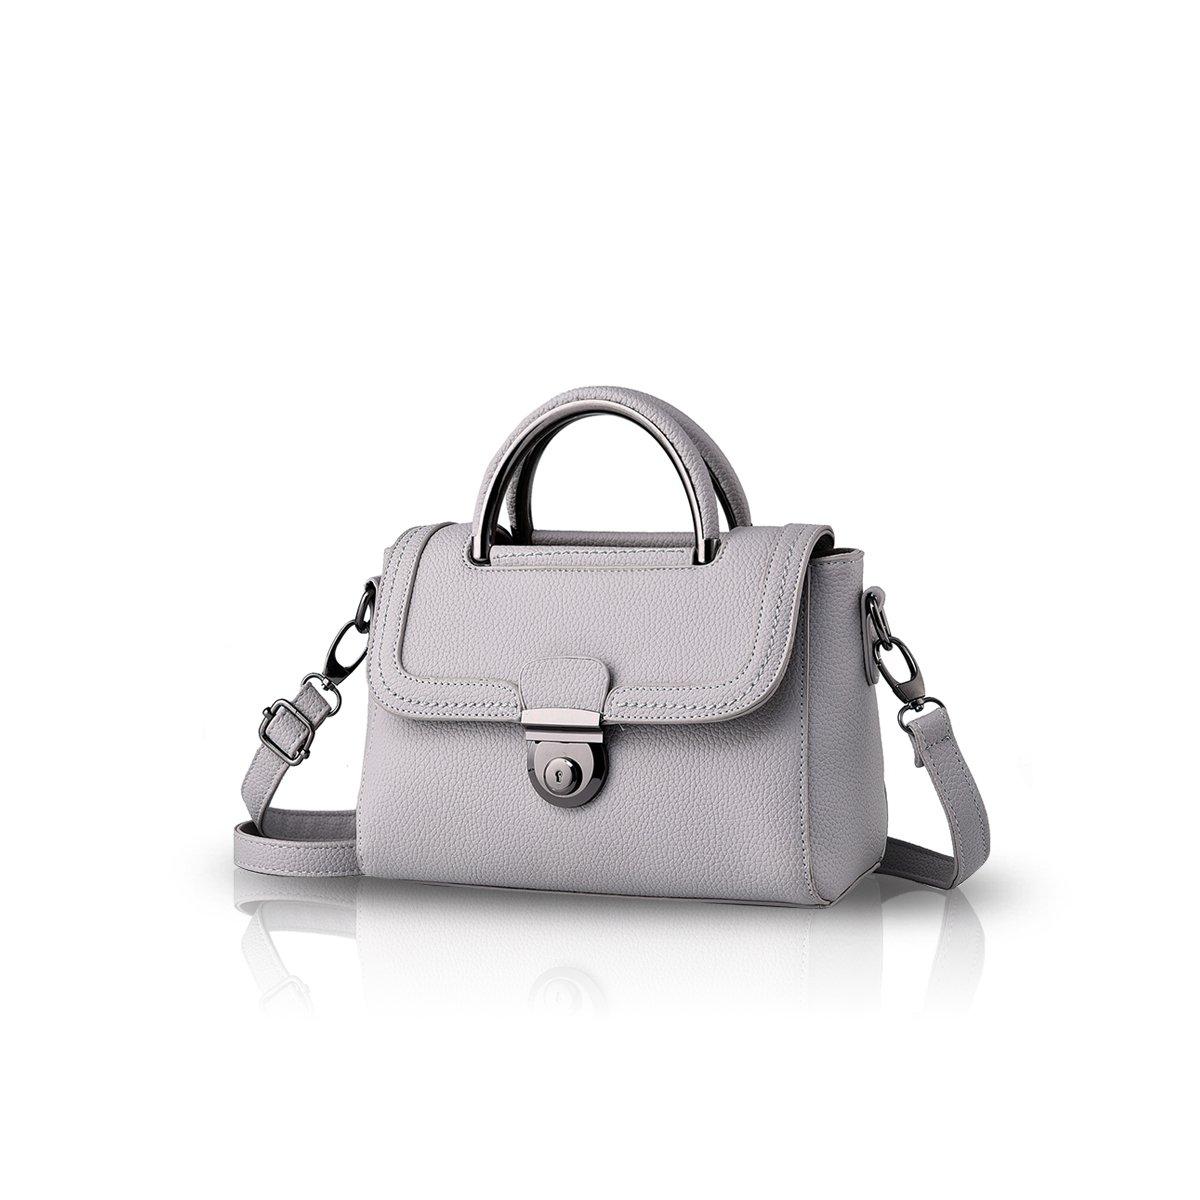 NICOLE& DORIS nuove donne borsa messenger bag borsa a tracolla piccola(Black) ND-Z004